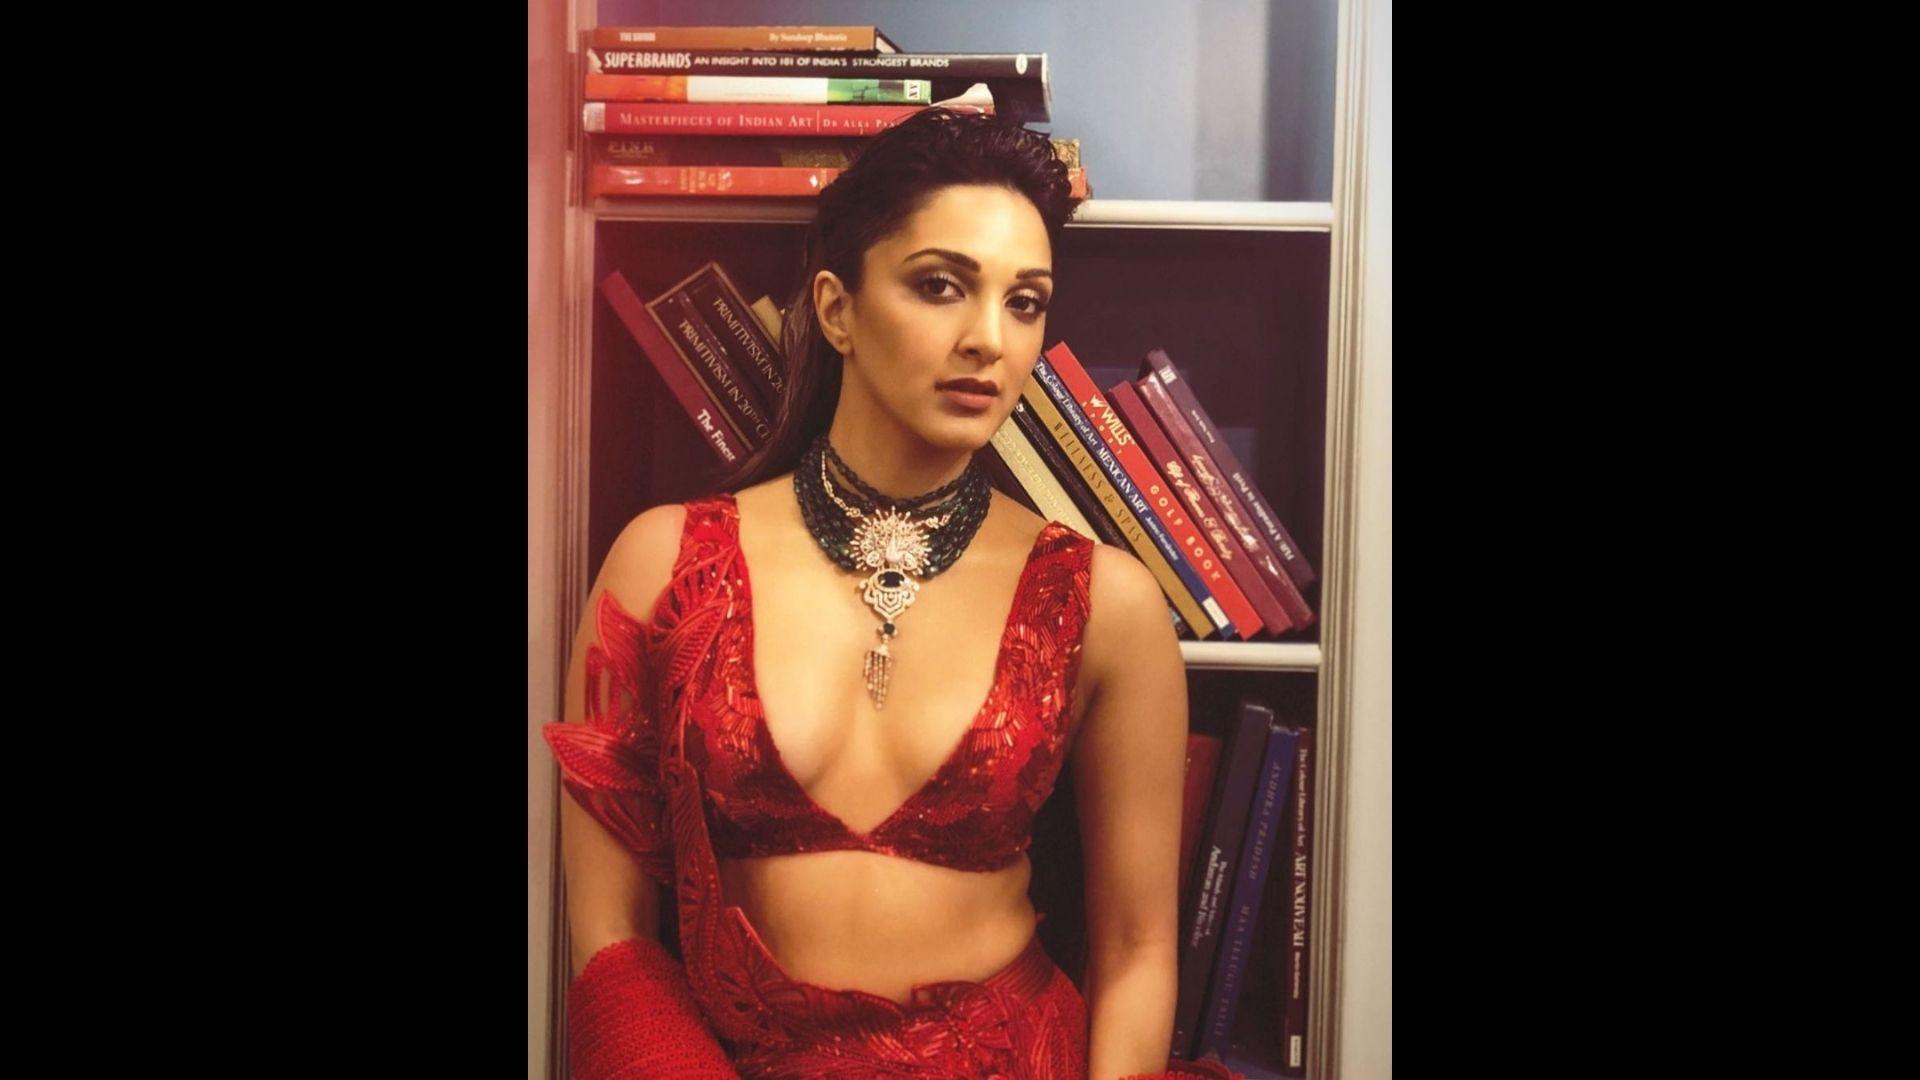 Kiara Advani's Red Lehenga Look Will Teach You How To Nail Any Wedding; Take Cues Ladies